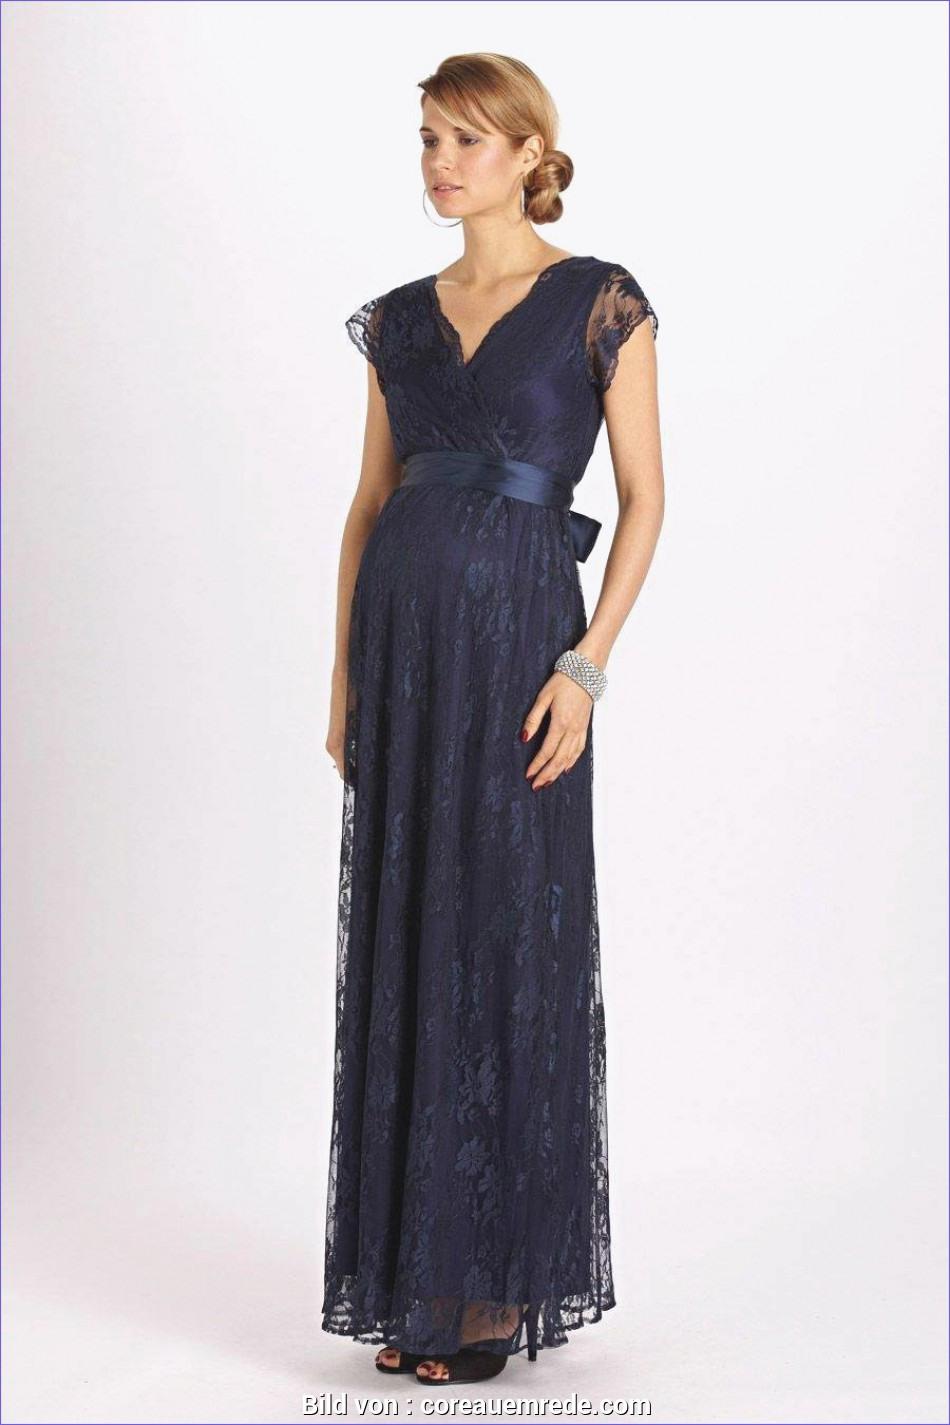 10 Wunderbar Abendkleid Umstandsmode Lang ÄrmelAbend Leicht Abendkleid Umstandsmode Lang Bester Preis